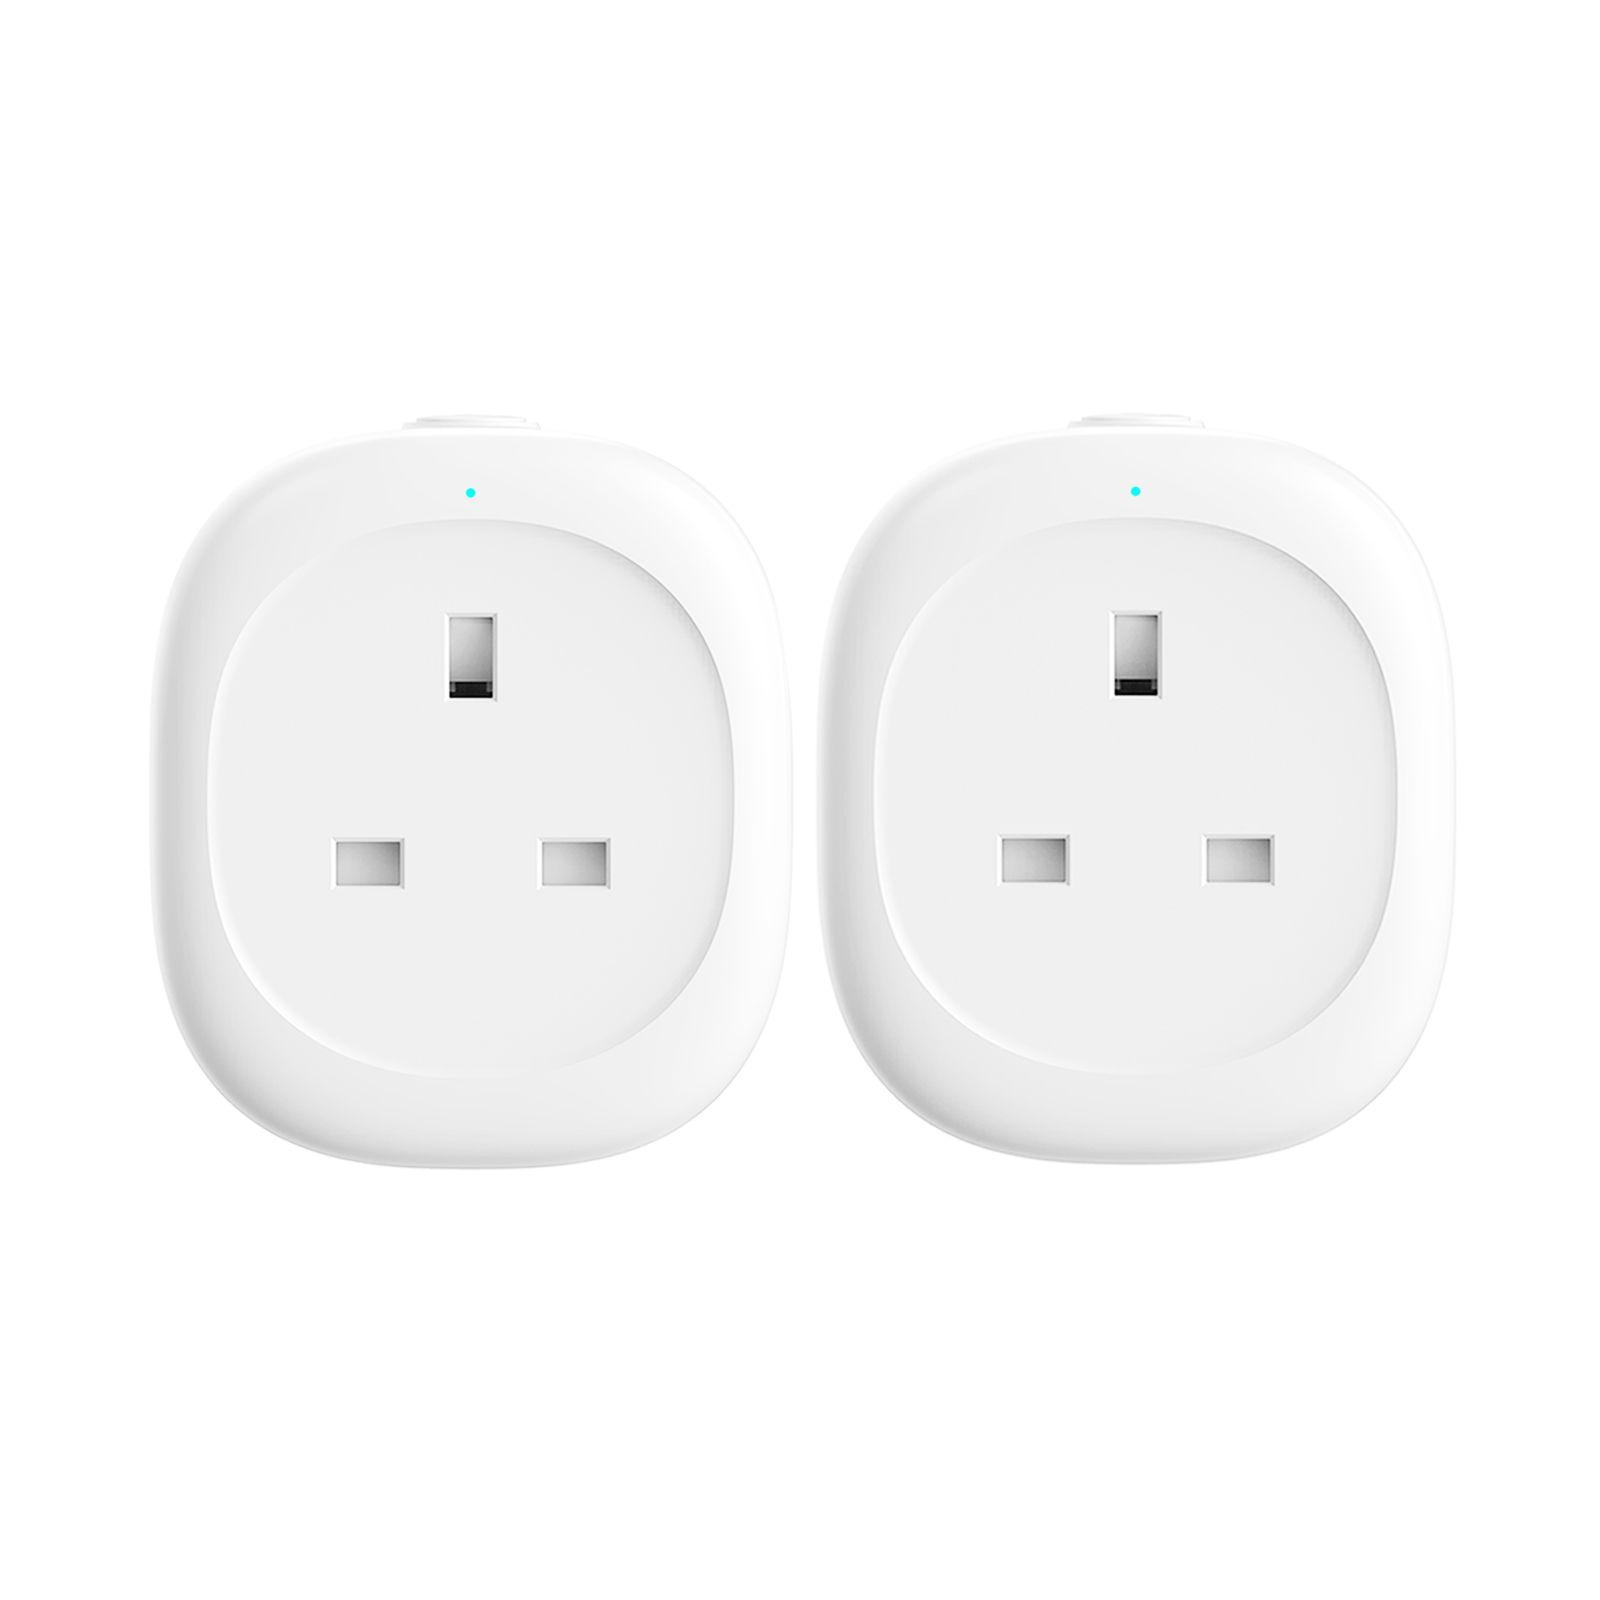 WiFi Smart Plug, Woostar WiFi Plug Sockets 东莞旗星电子科技智能WIFI插座